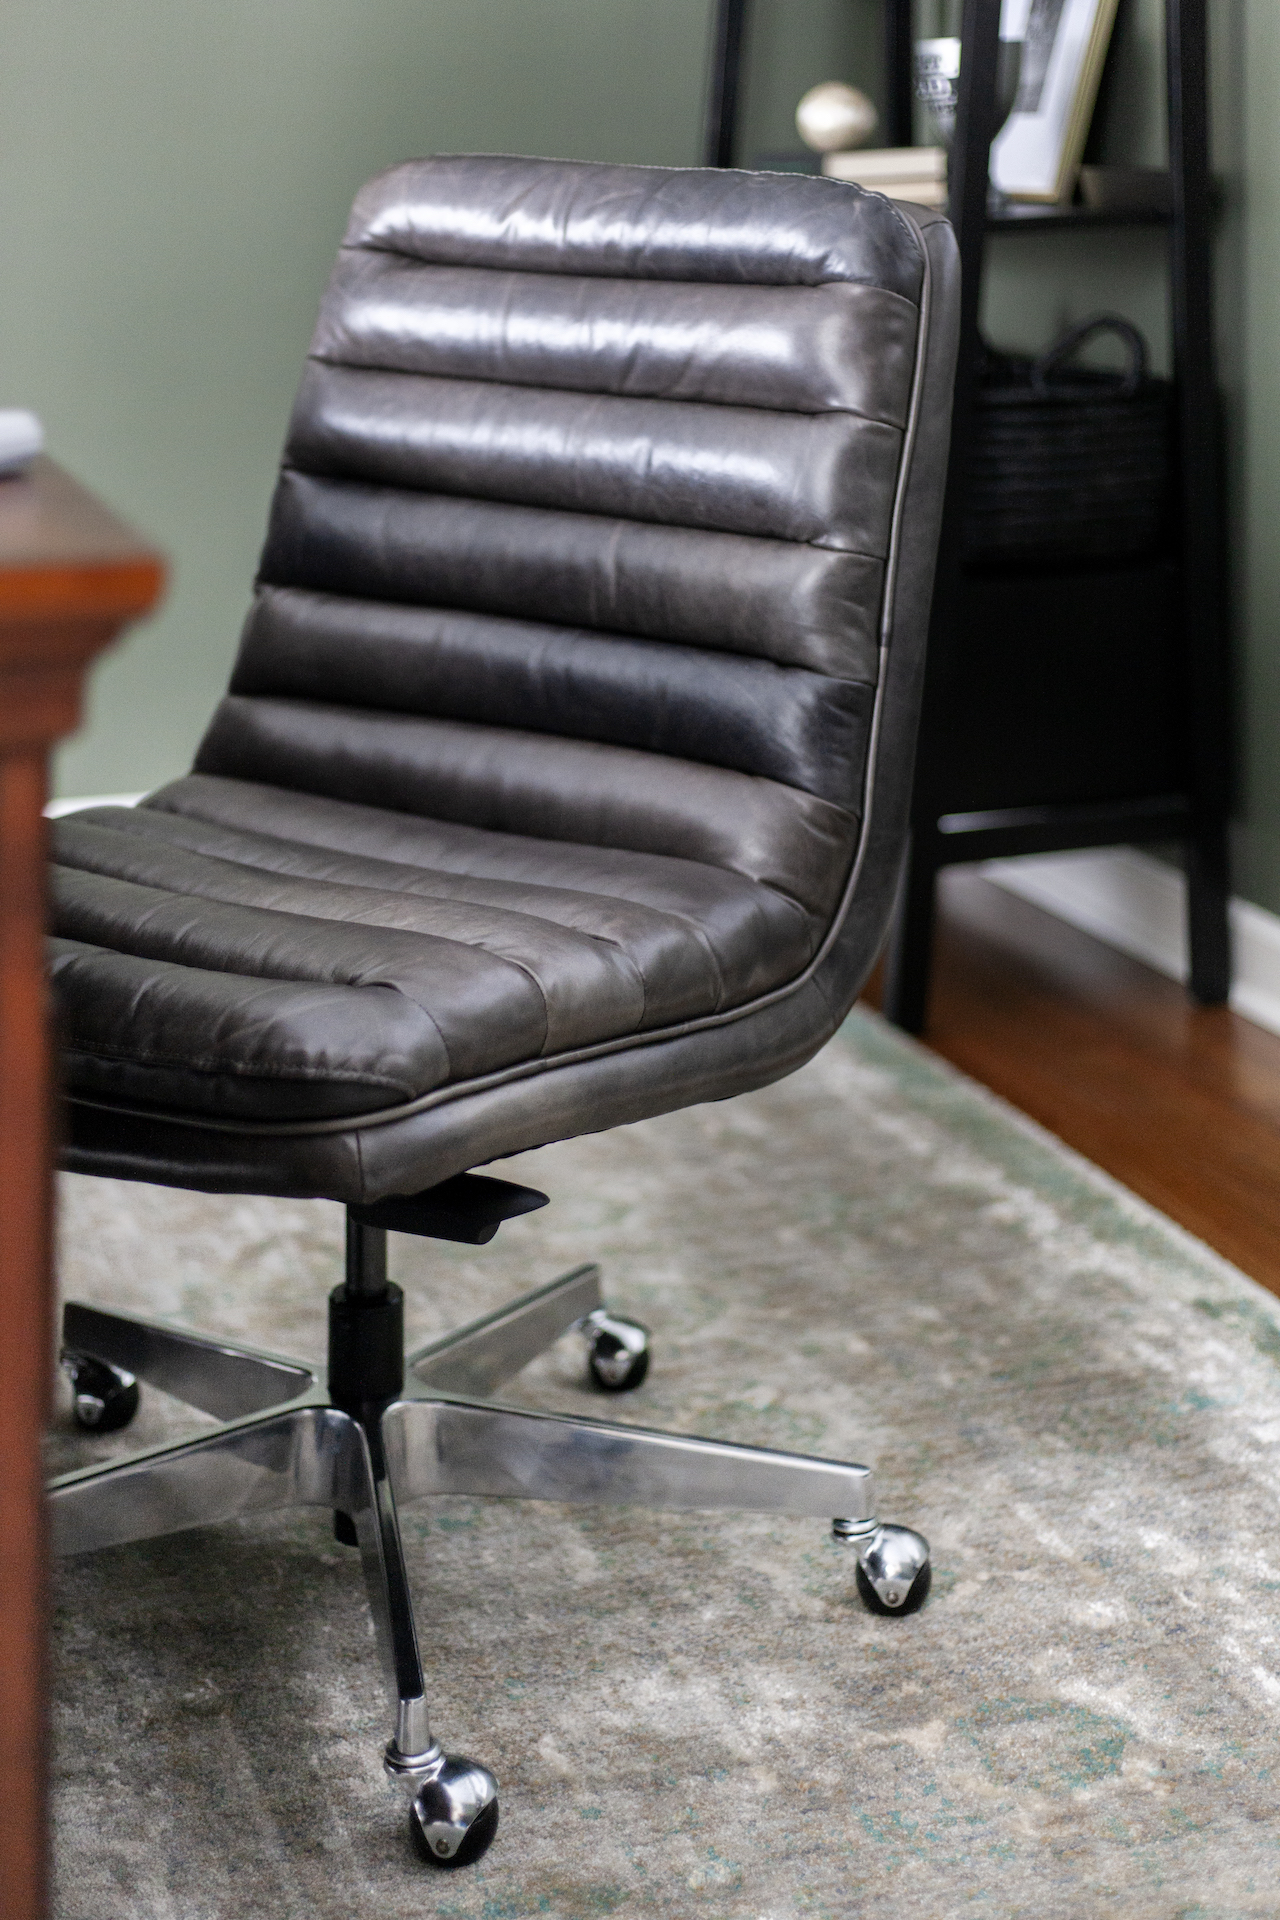 SHOP THE LOOK        Wyatt Home Office Chair